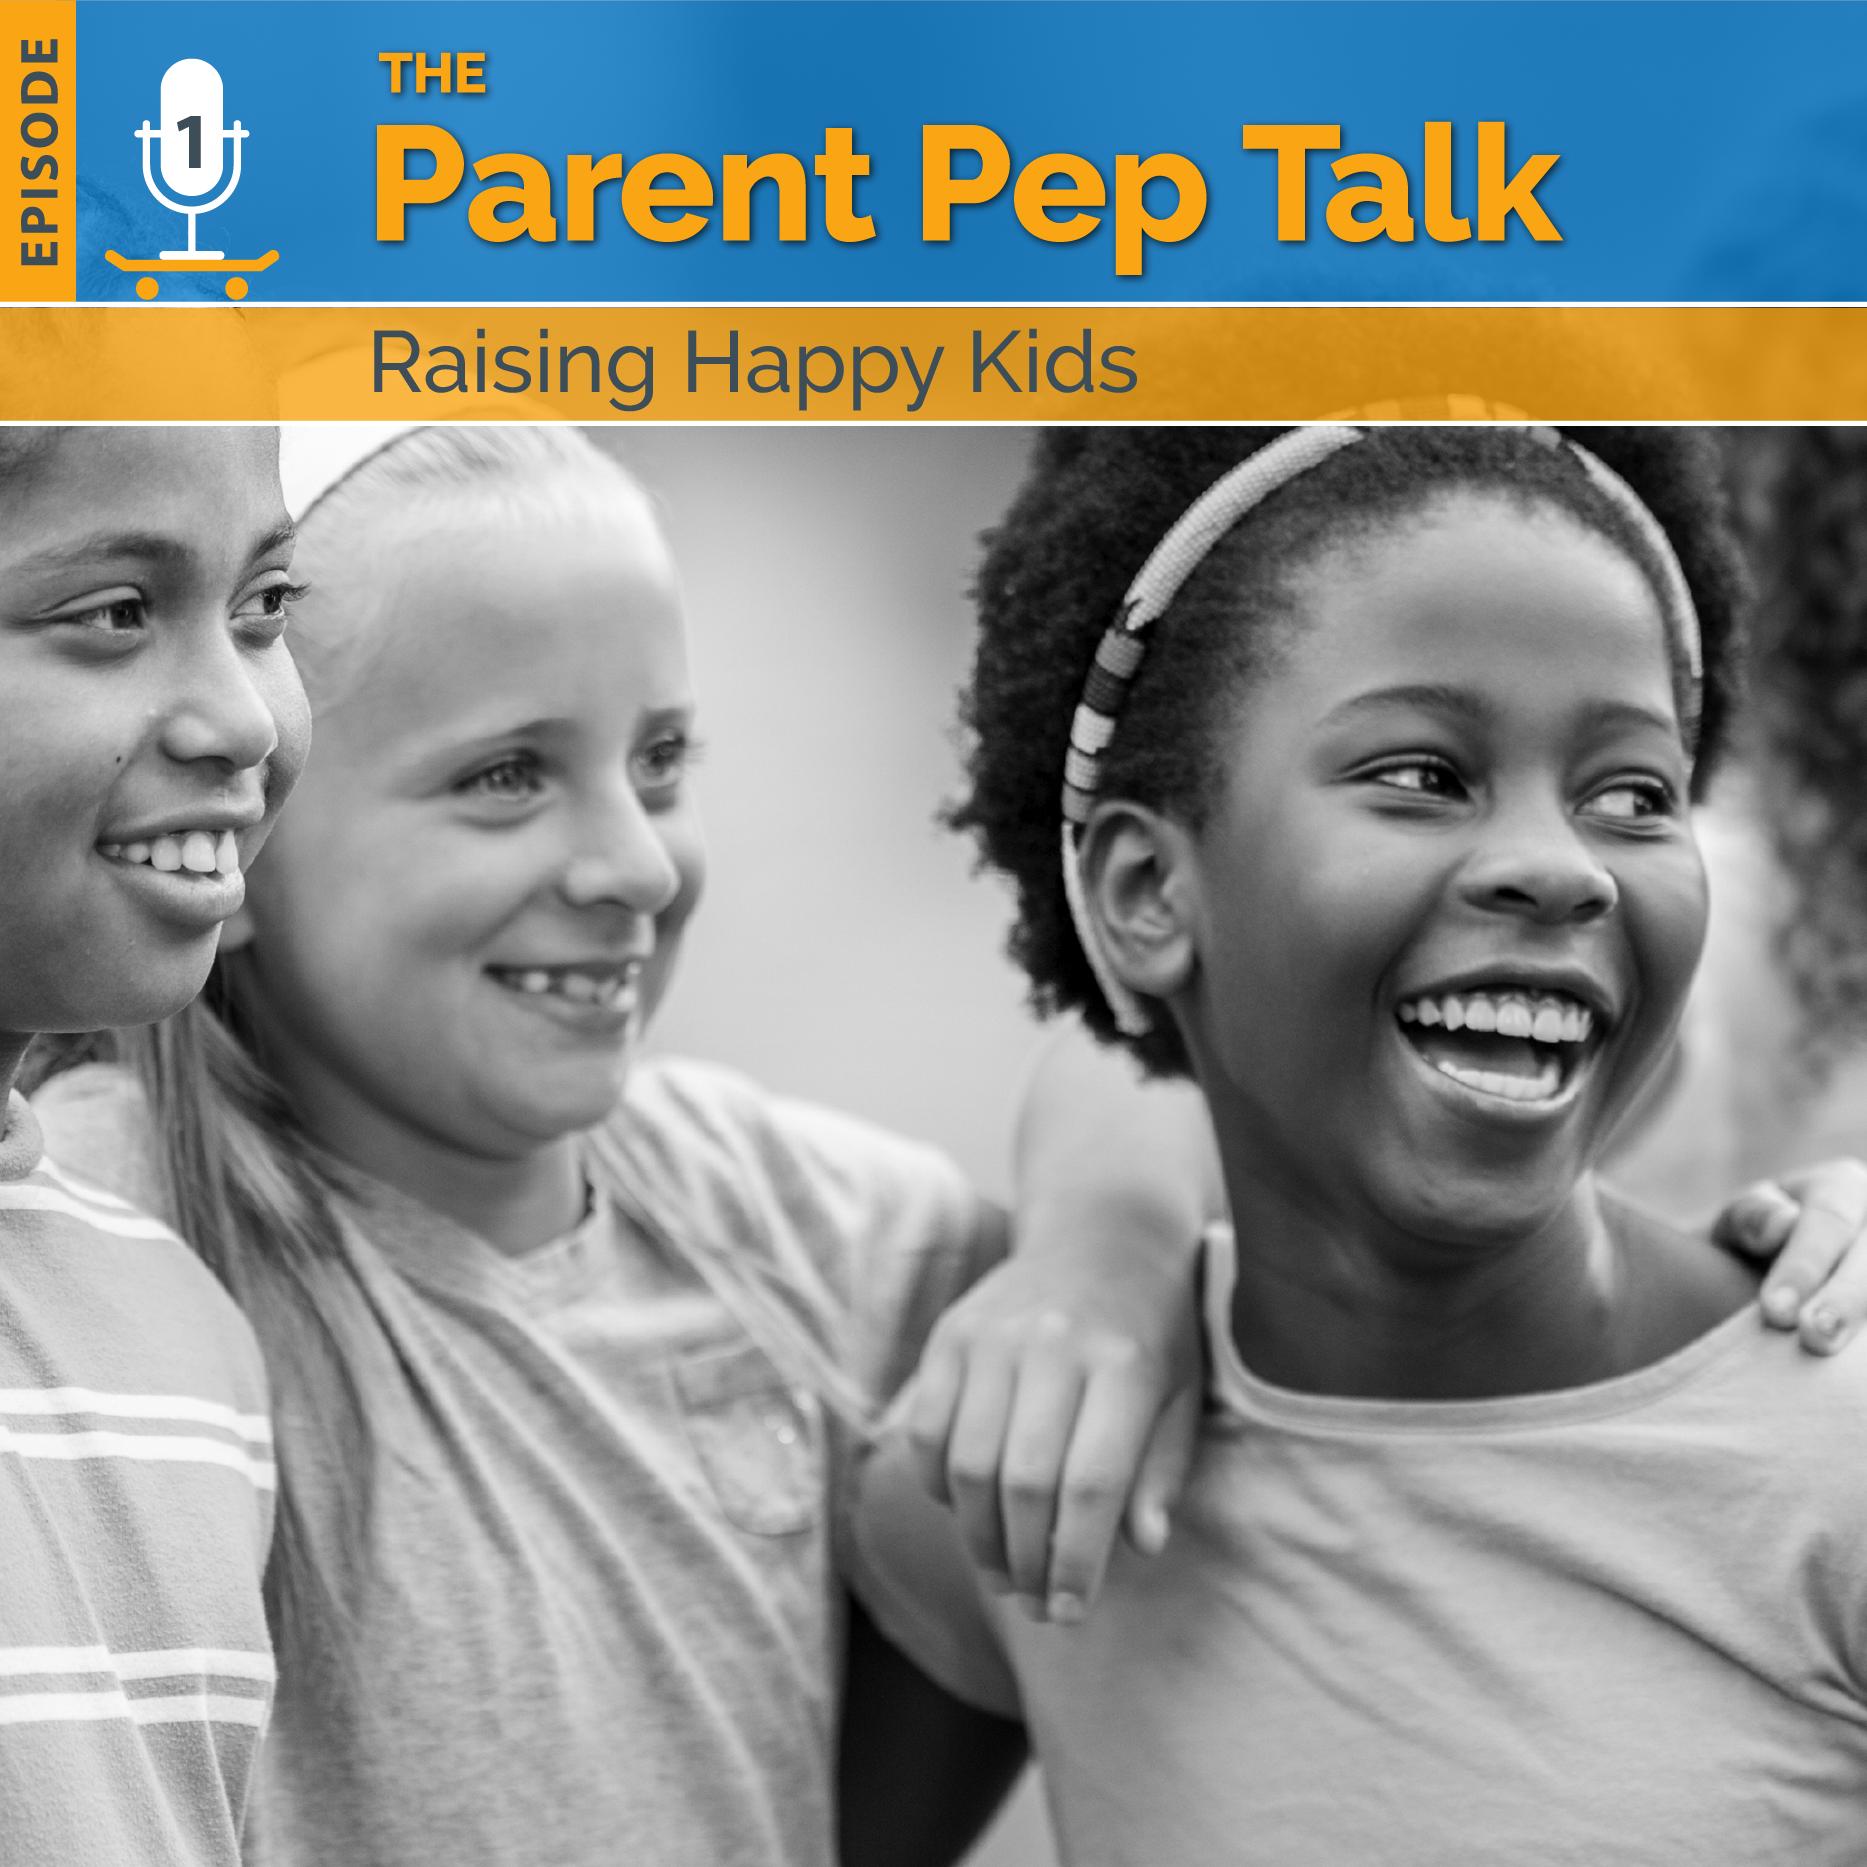 Parent Pep Talk episode 1